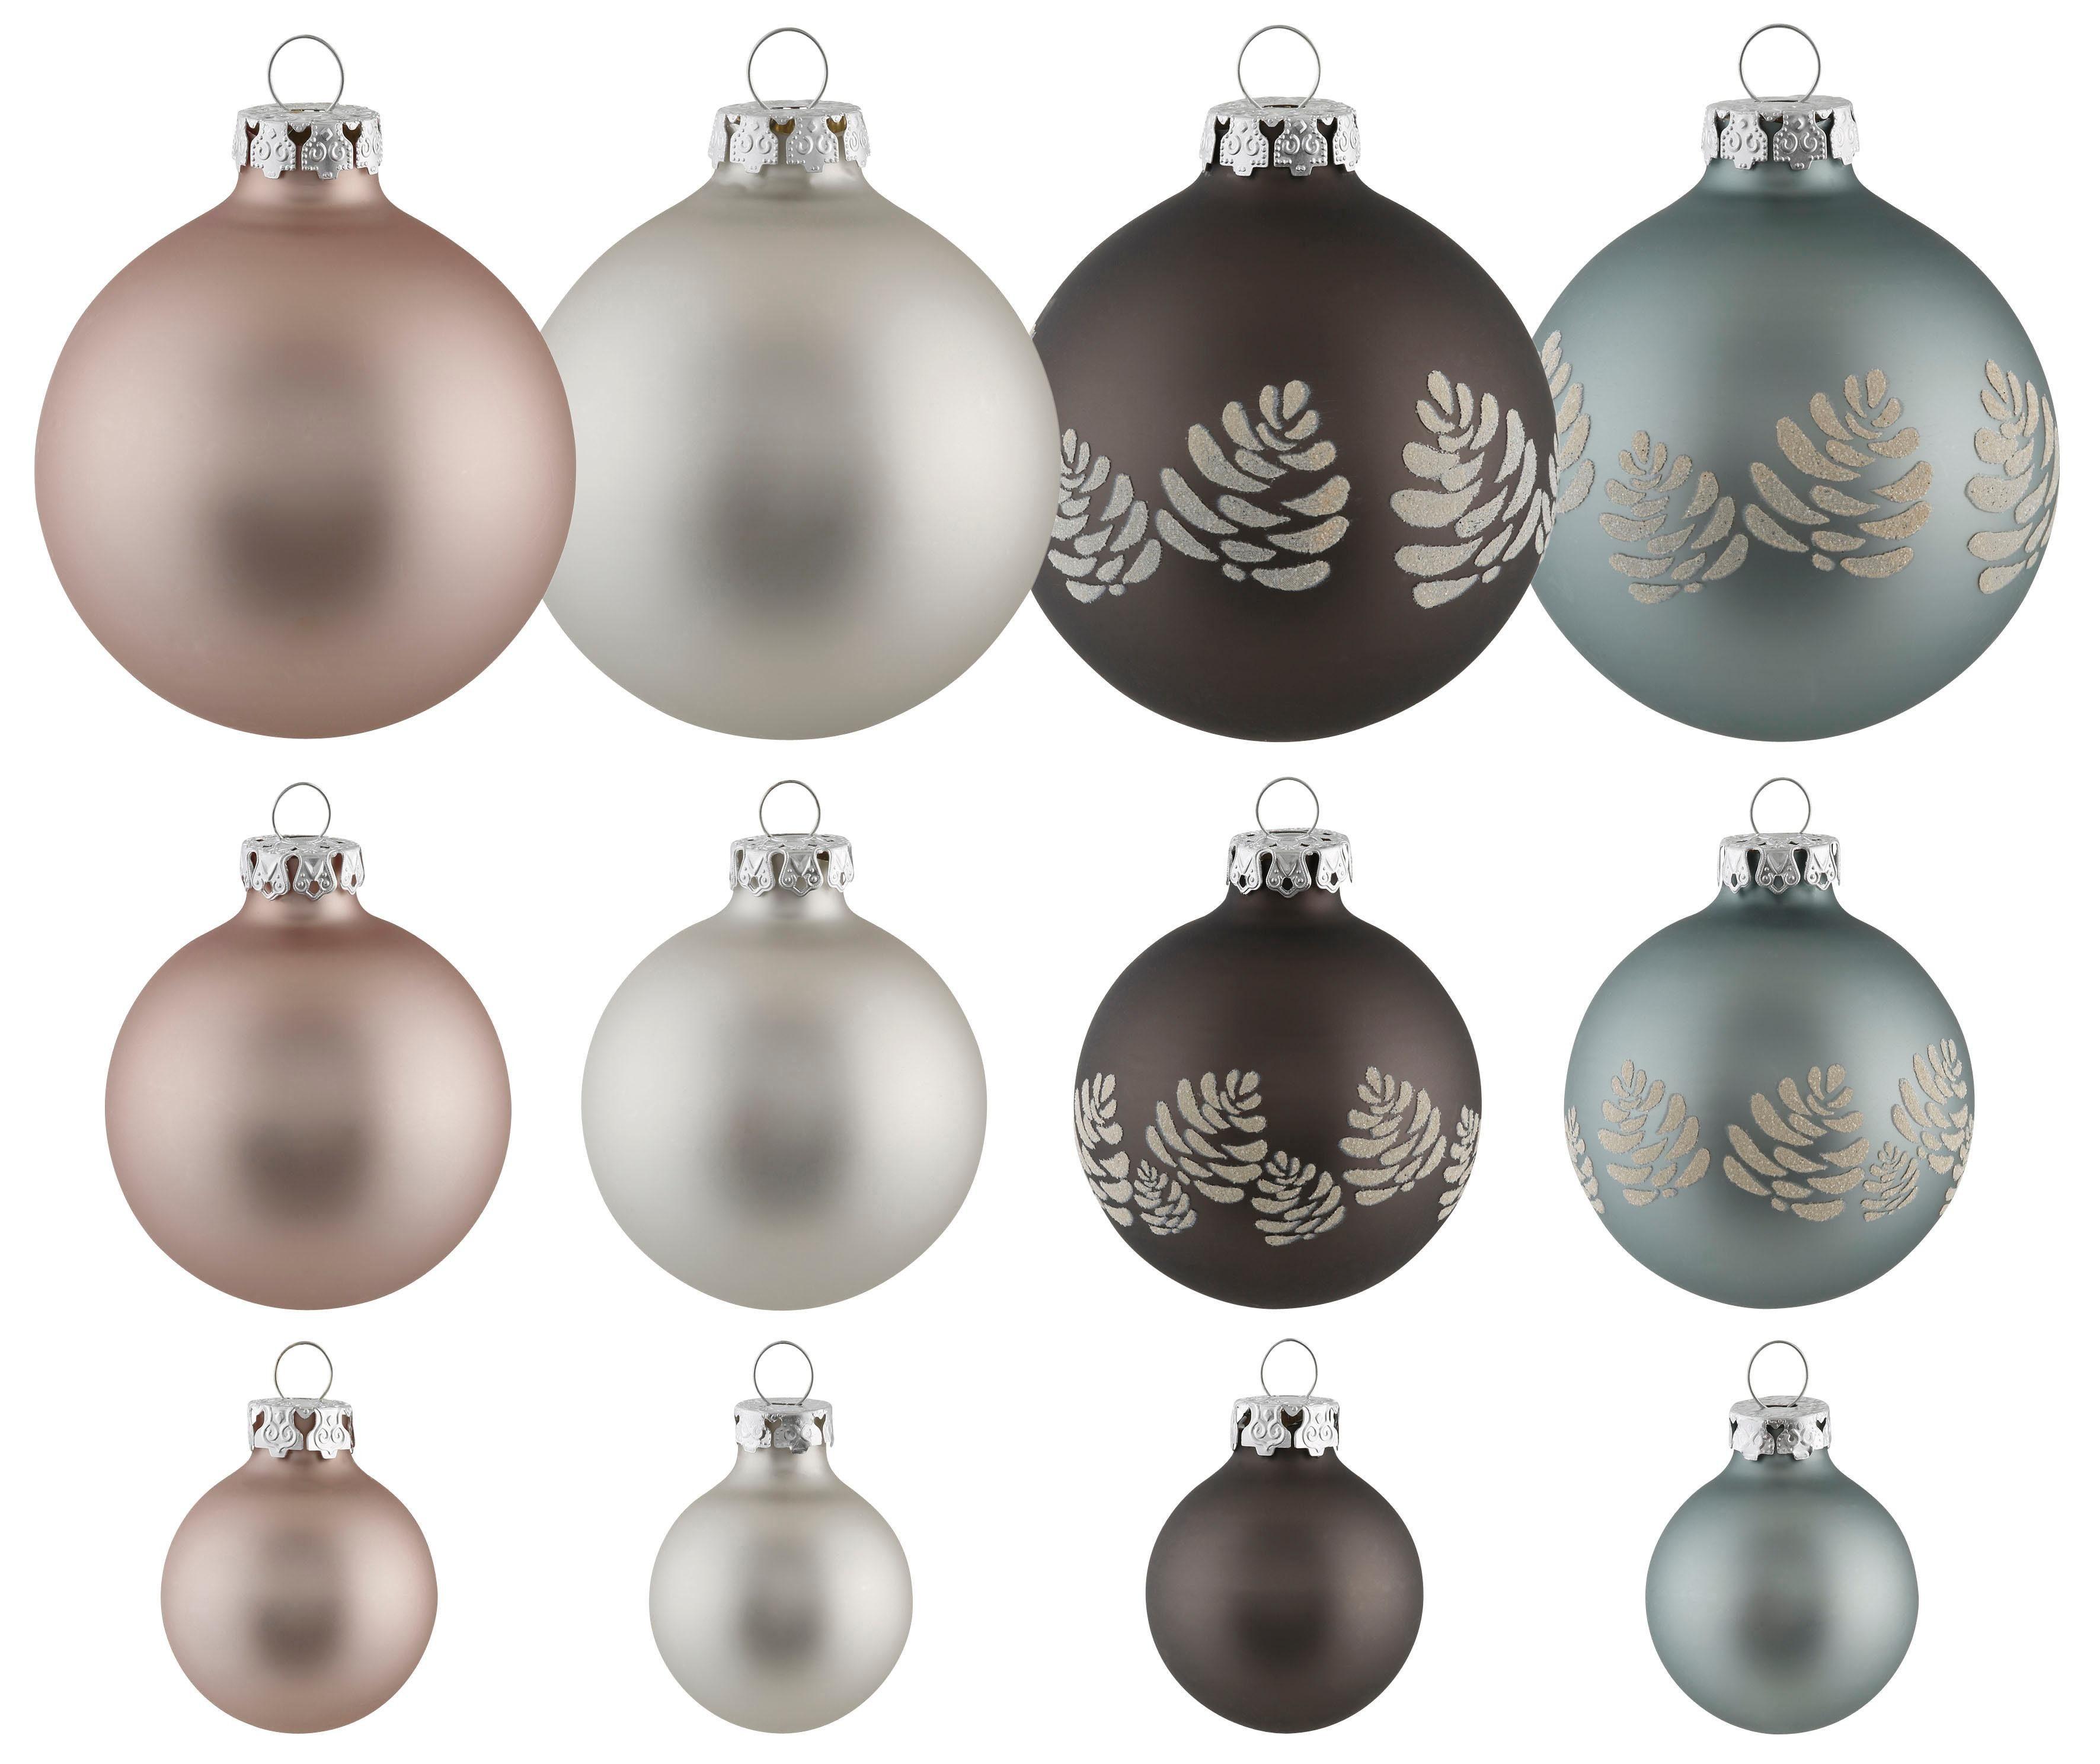 Thüringer Glasdesign TGS-Weihnachtskugeln, Made in Germany, (30-teilig), »Raw Atmosphere«